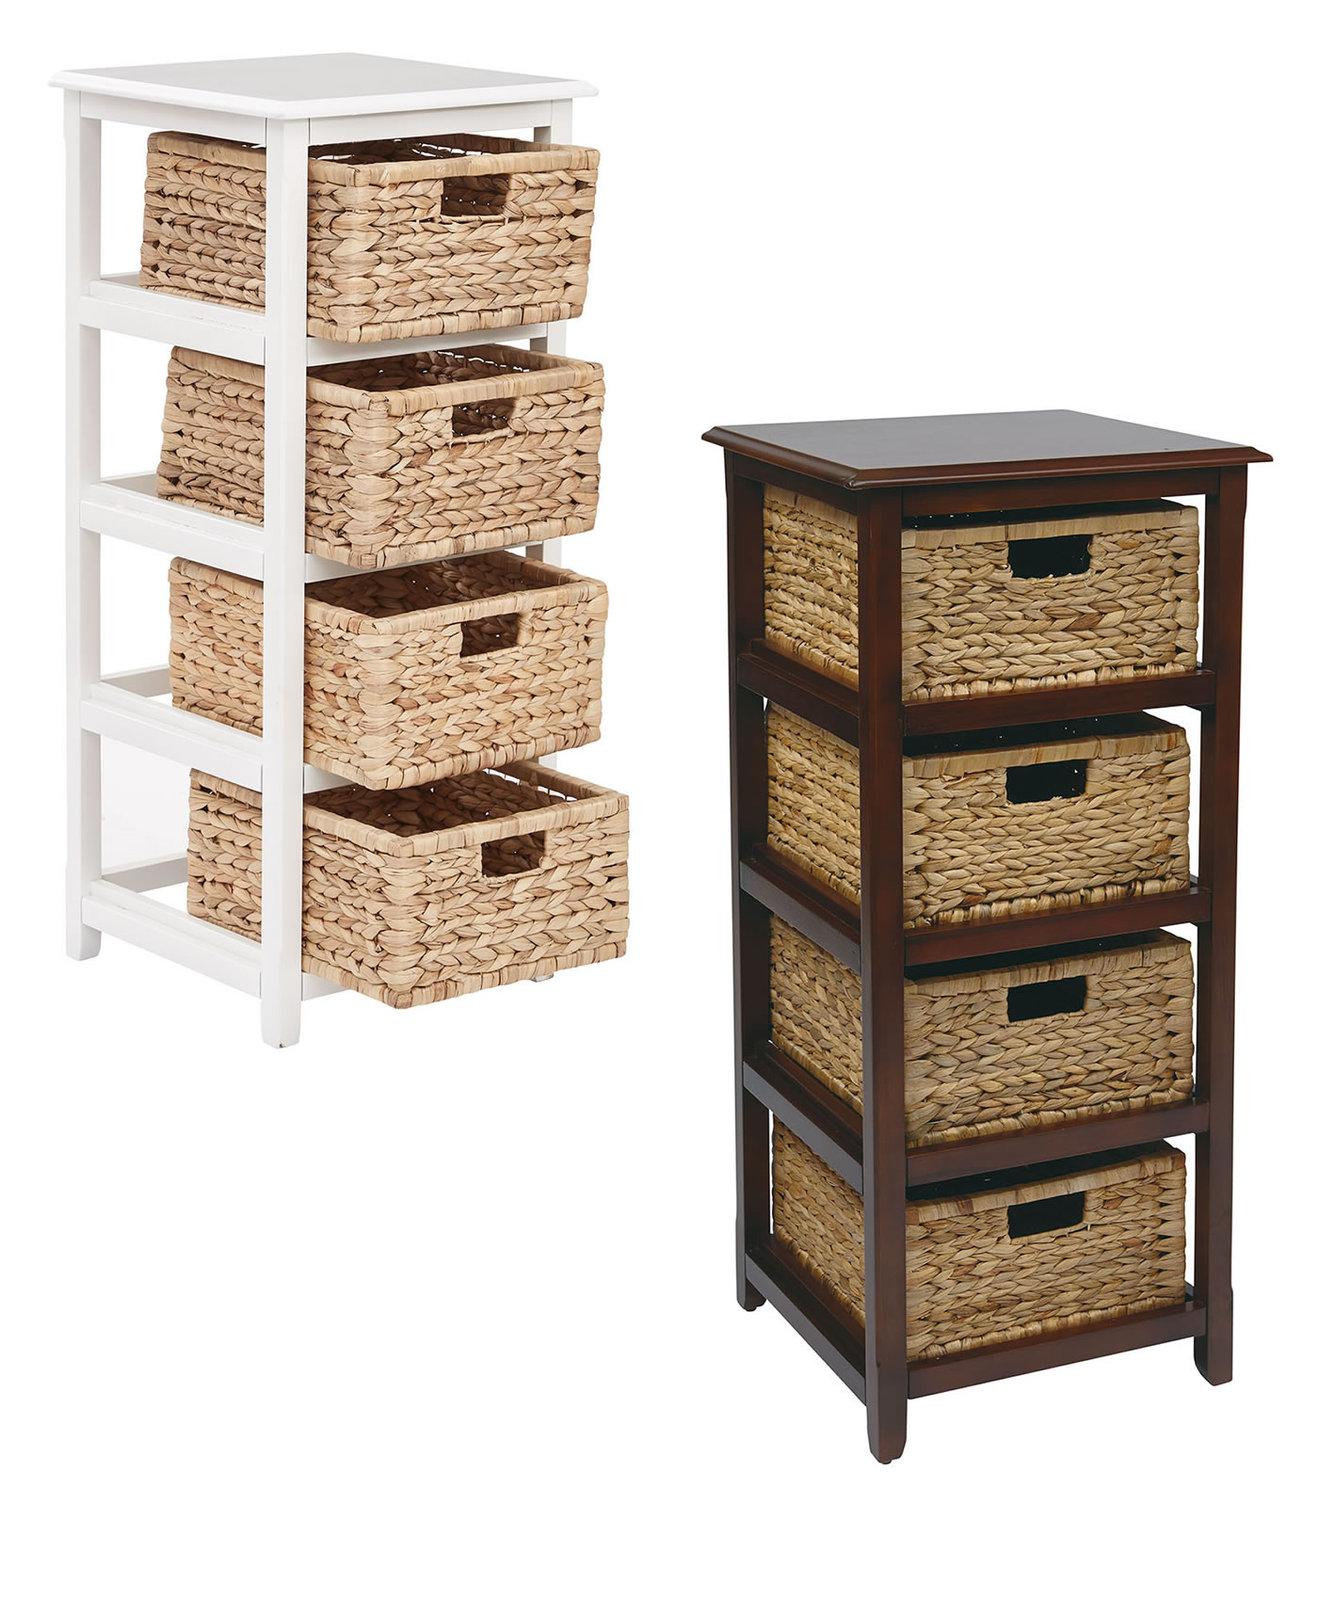 4 Drawer Espresso Or White Wood Storage